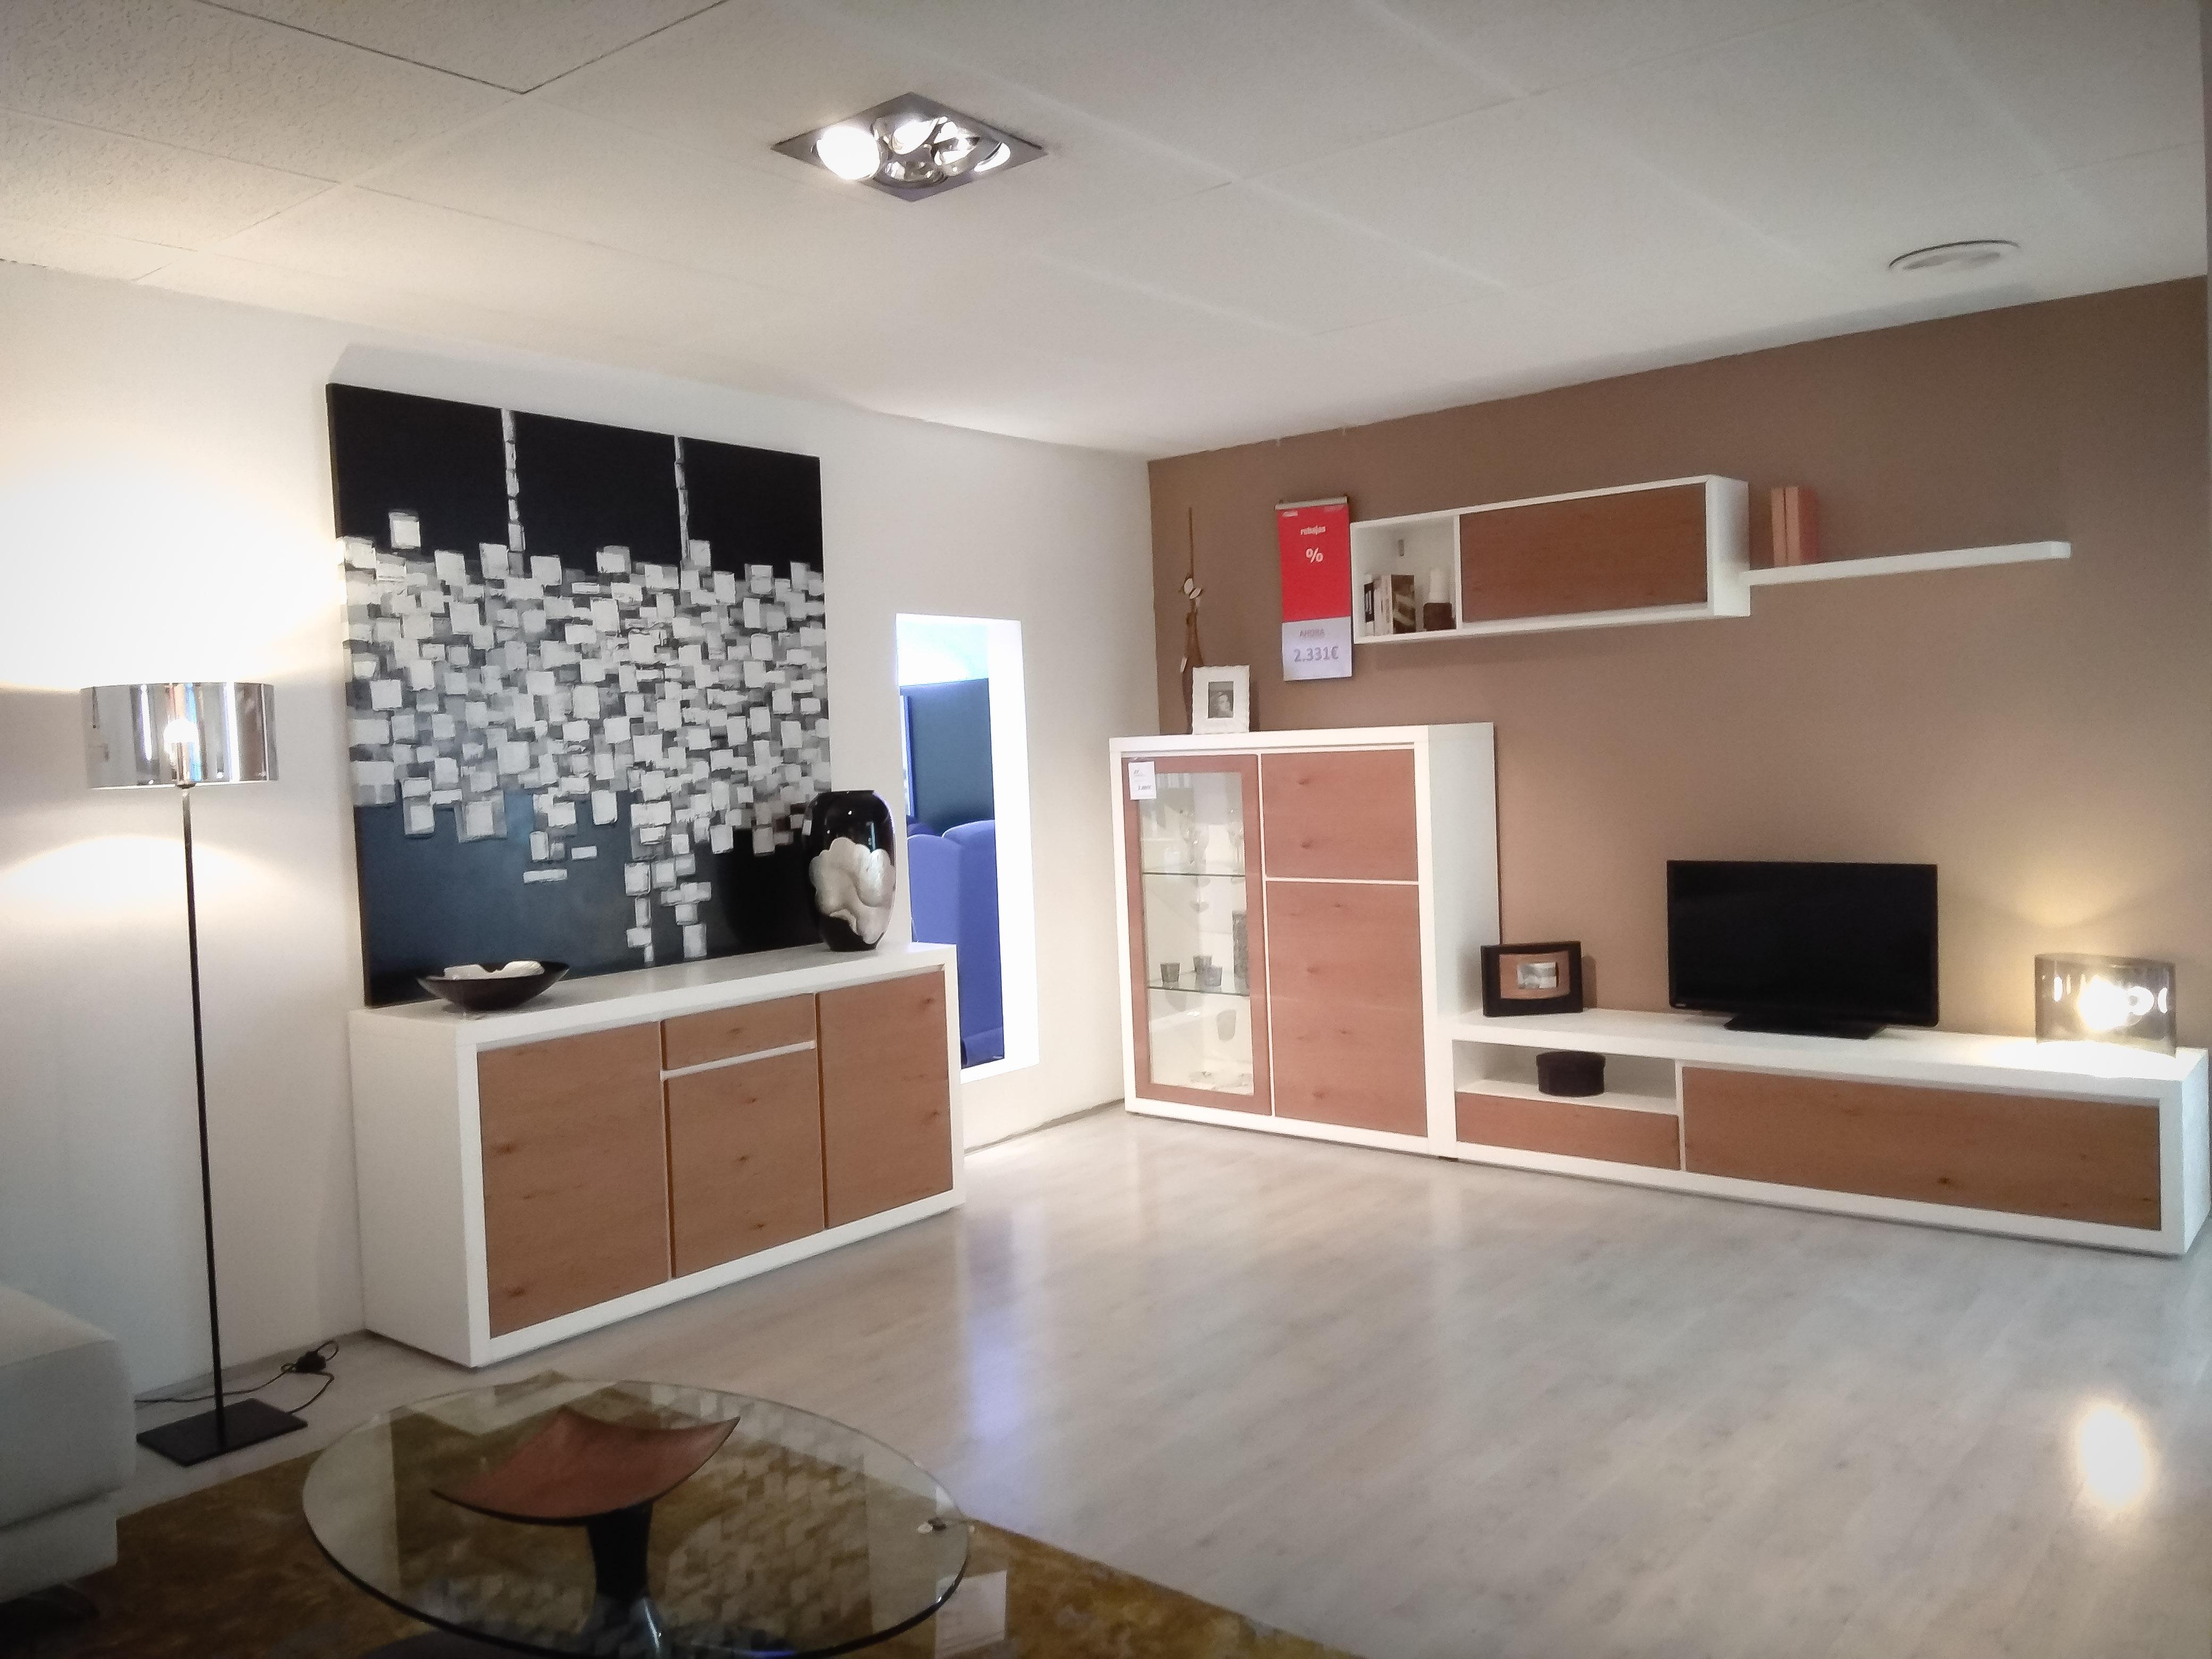 Aparadores muebles jp - Aparadores de salon ...